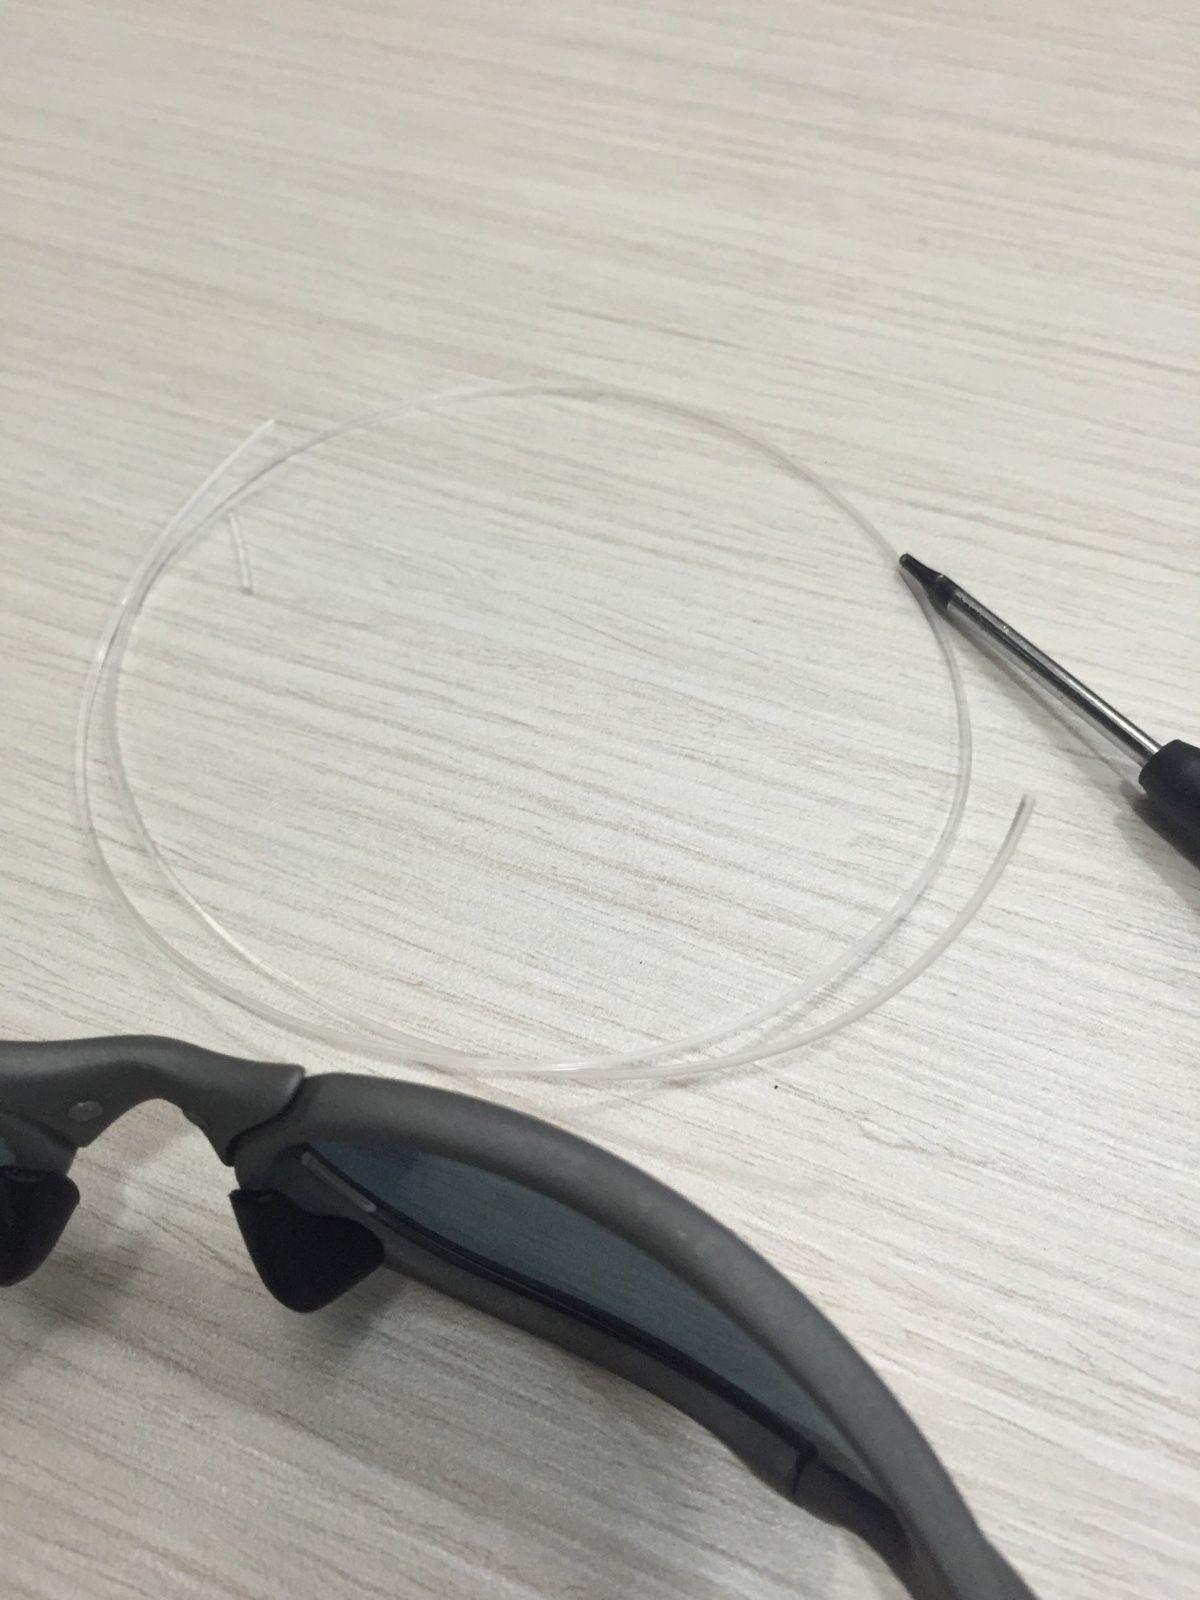 Oakley Penny - X - Metal Refinished - Aftermarket Wiggly Lenses - Fix - 2016-03-16 12.32.58.jpg